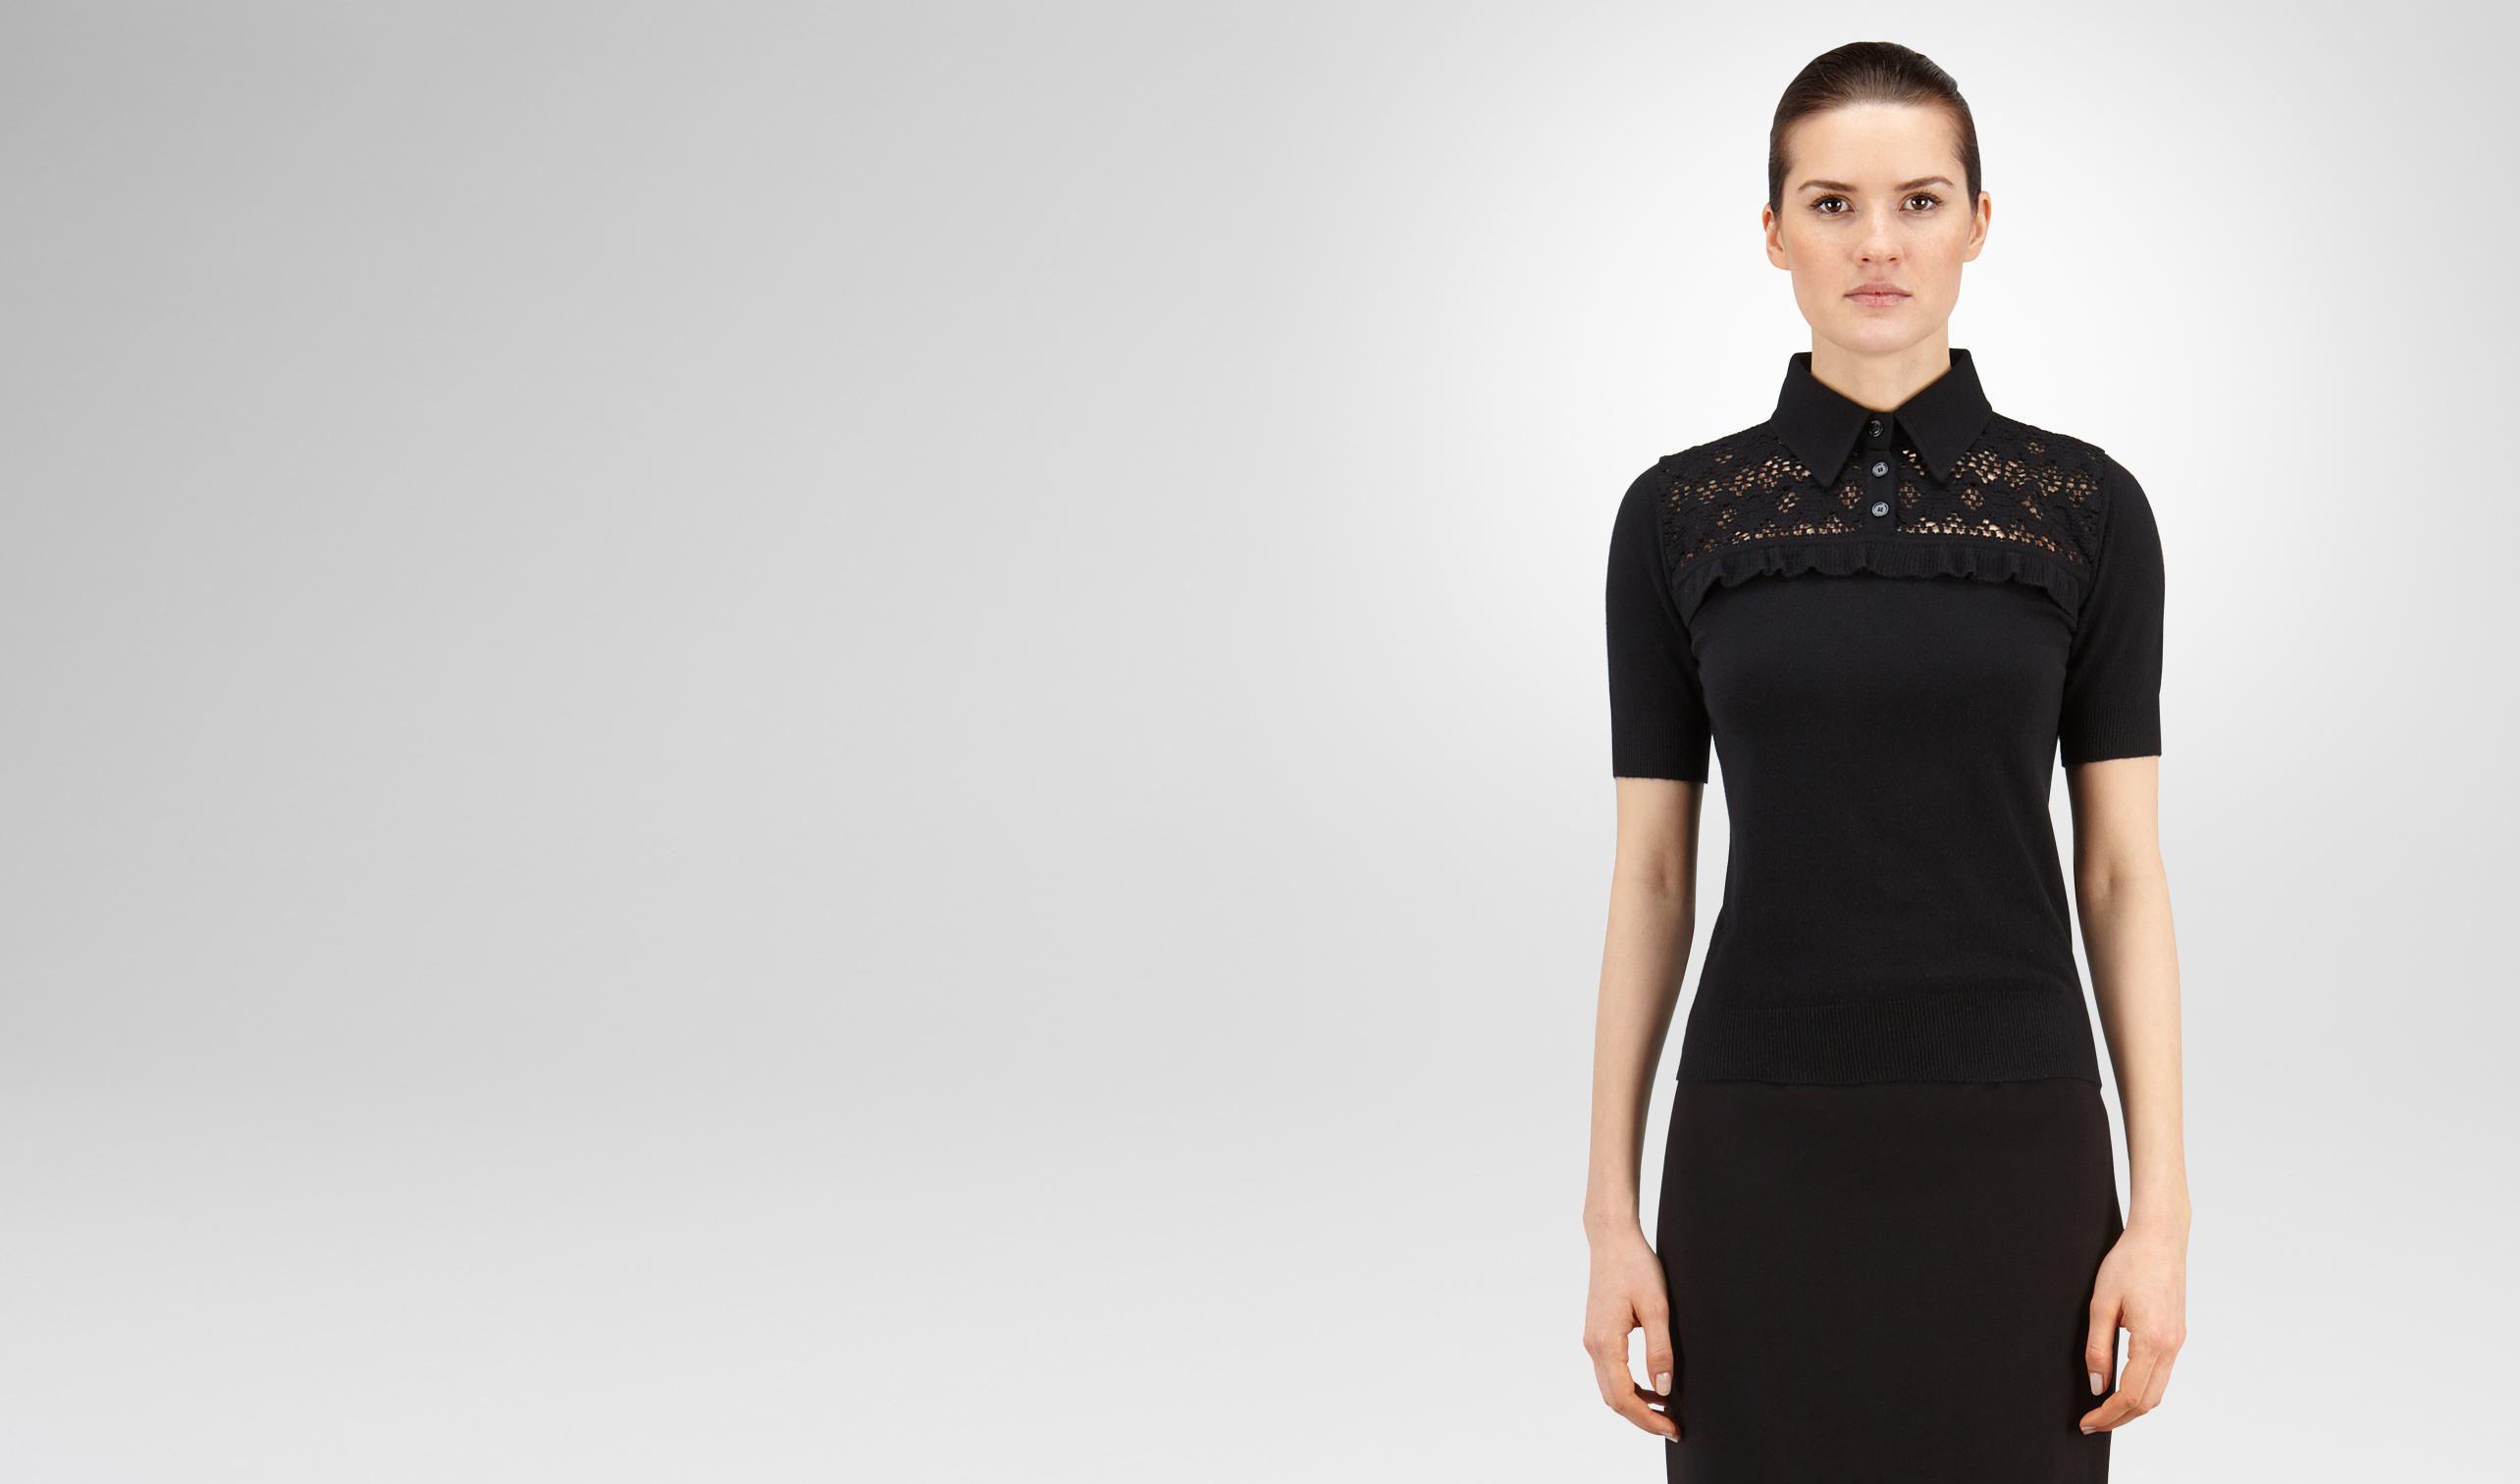 BOTTEGA VENETA Knitwear or Top or Shirt D SWEATER IN NERO CASHMERE, RUFFLE DETAIL pl